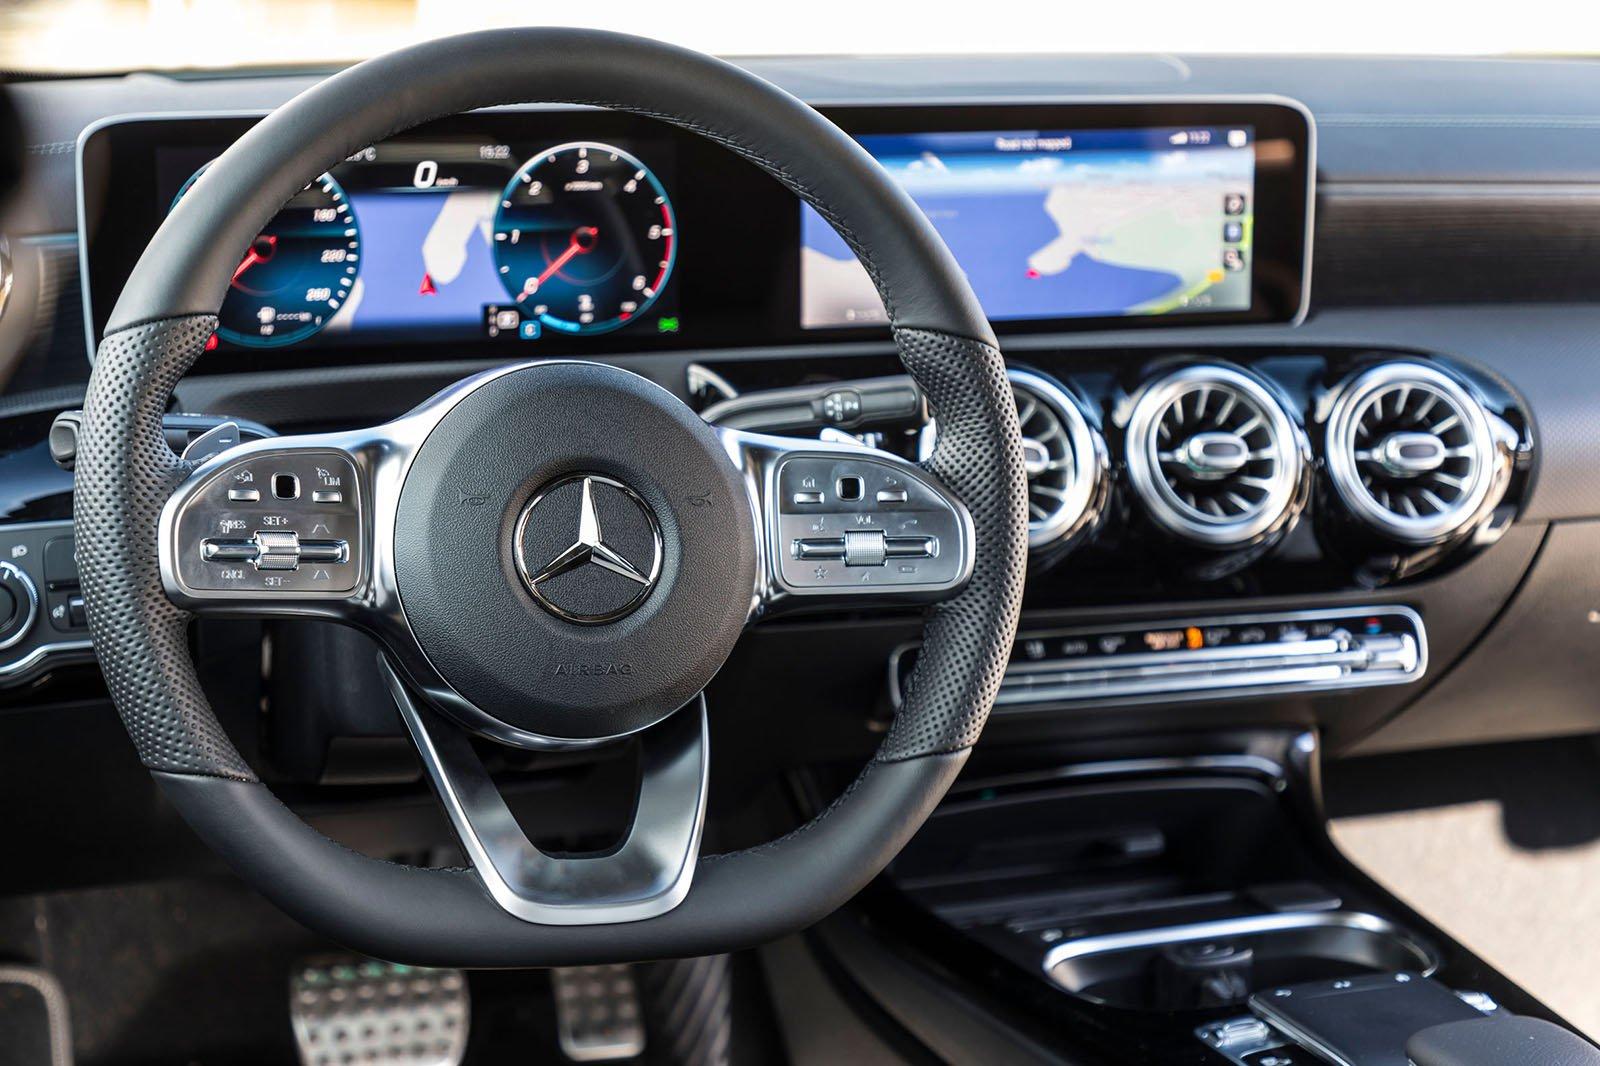 Mercedes CLA 2019 LHD dashboard